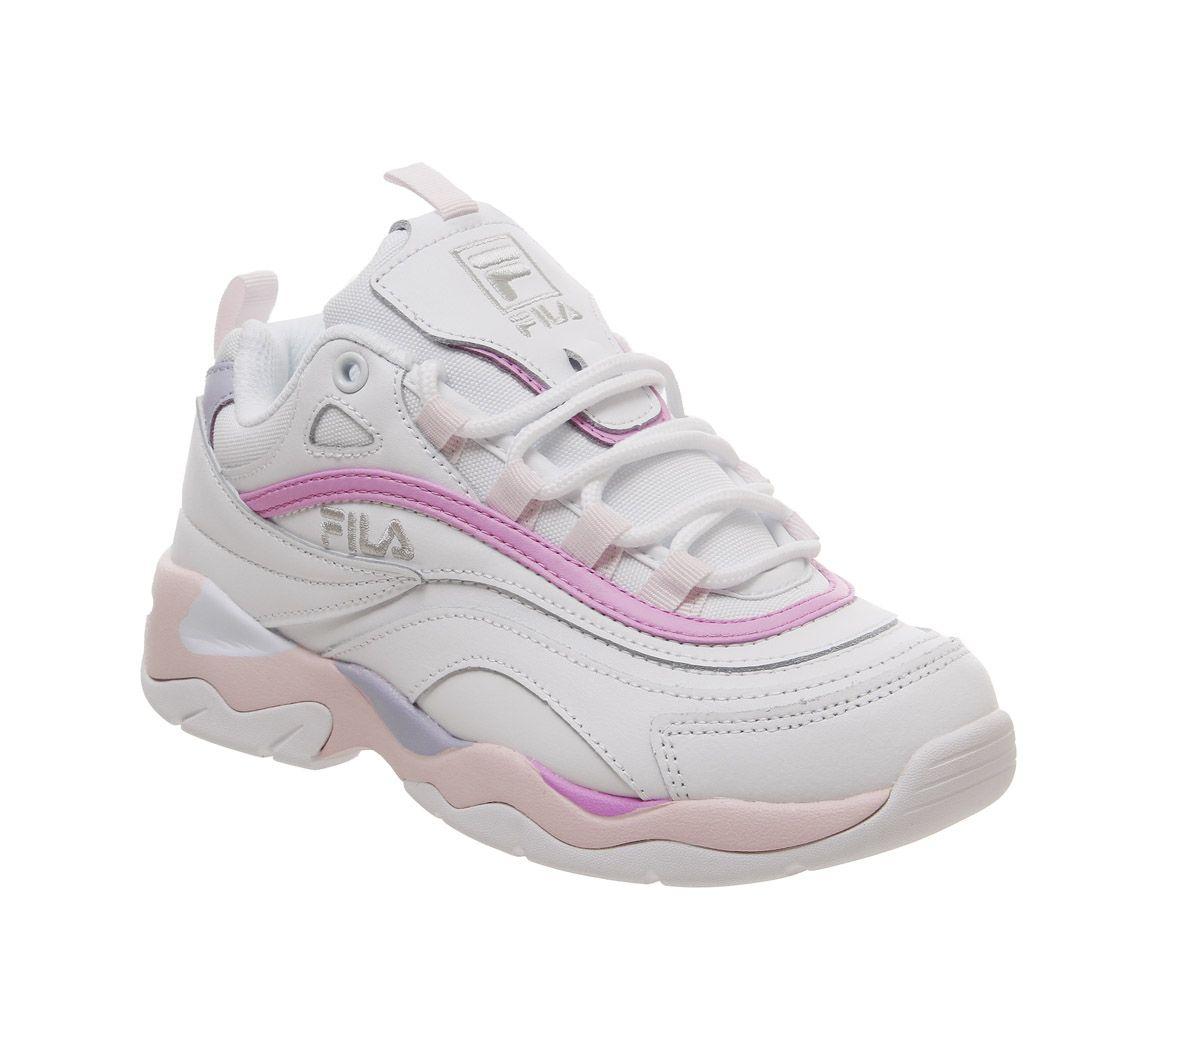 8a68f4e0d589 Fila Fila Ray Trainers White Heavenly Pink Purple - Hers trainers